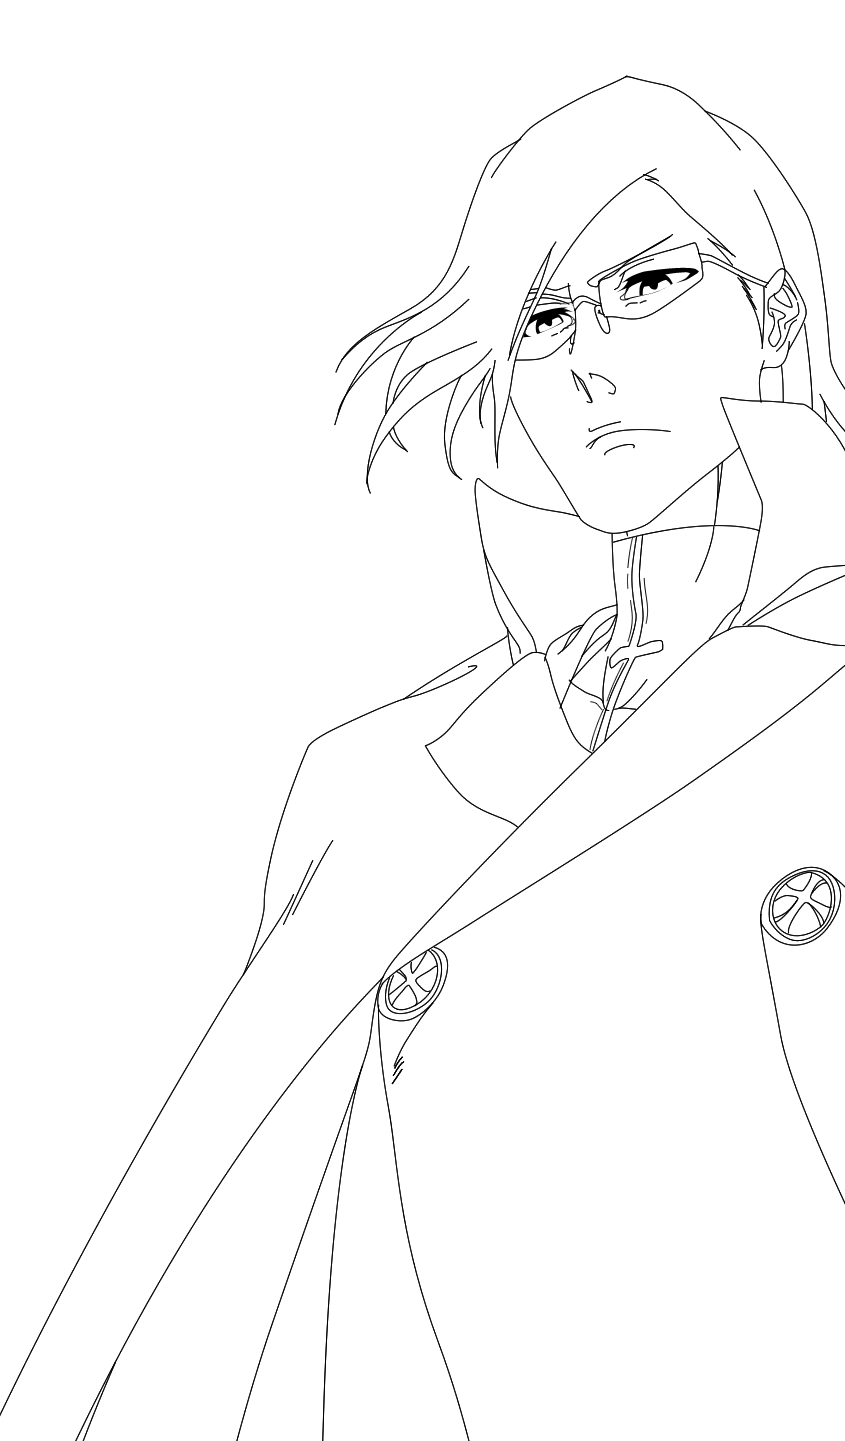 Ishida Bleach 586 Lineart By Ironizer On Deviantart Anime Lineart Superhero Art Drawings [ 1441 x 845 Pixel ]